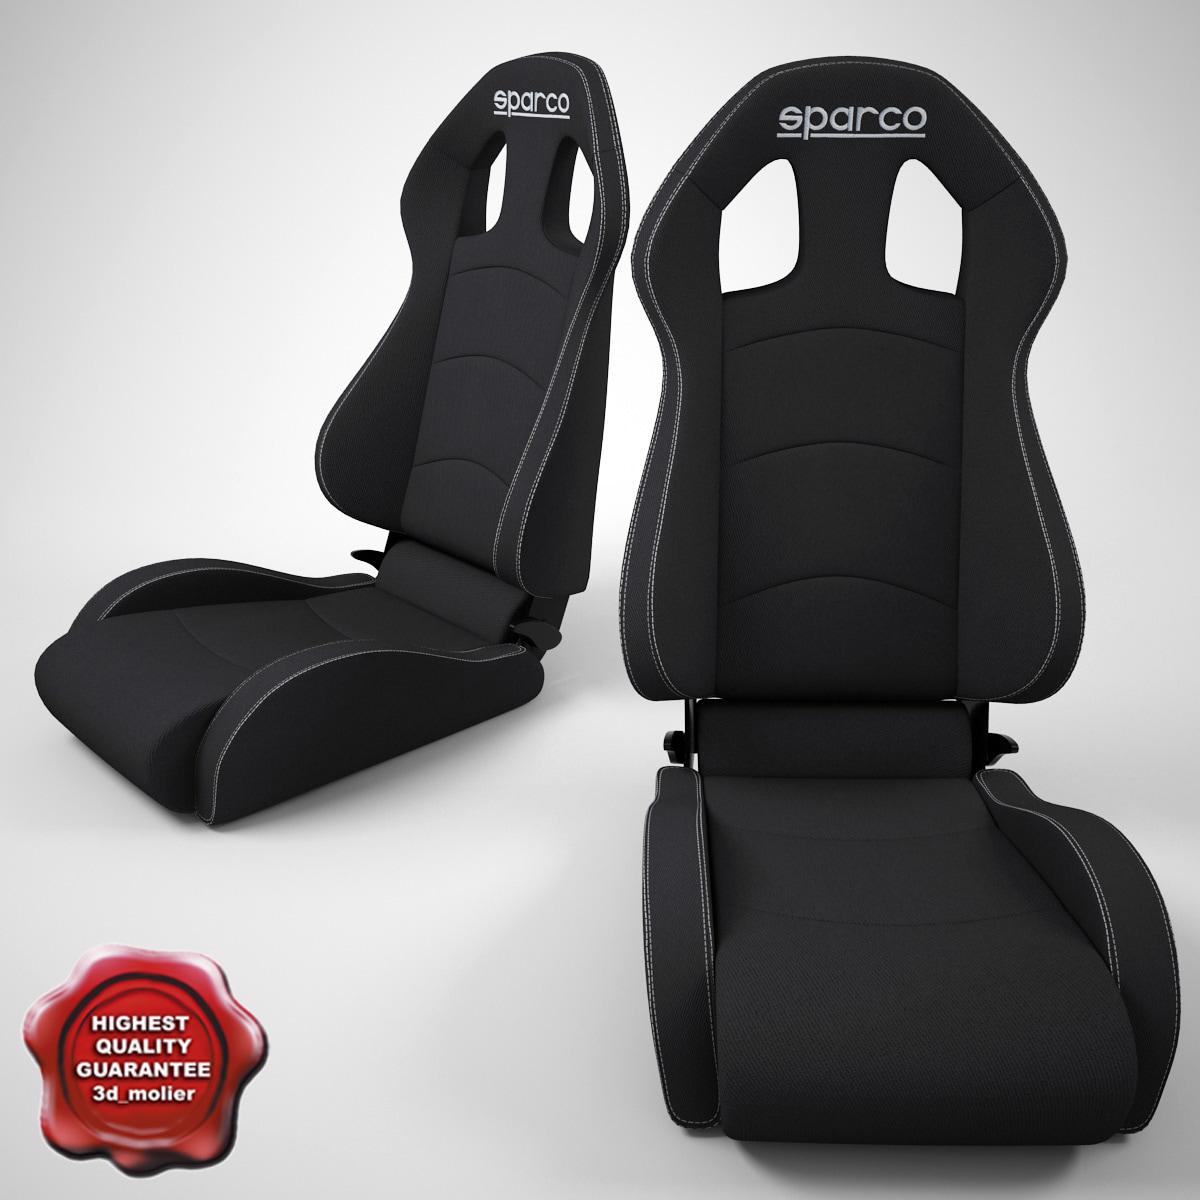 Auto_Seat_Sparco_00.jpg